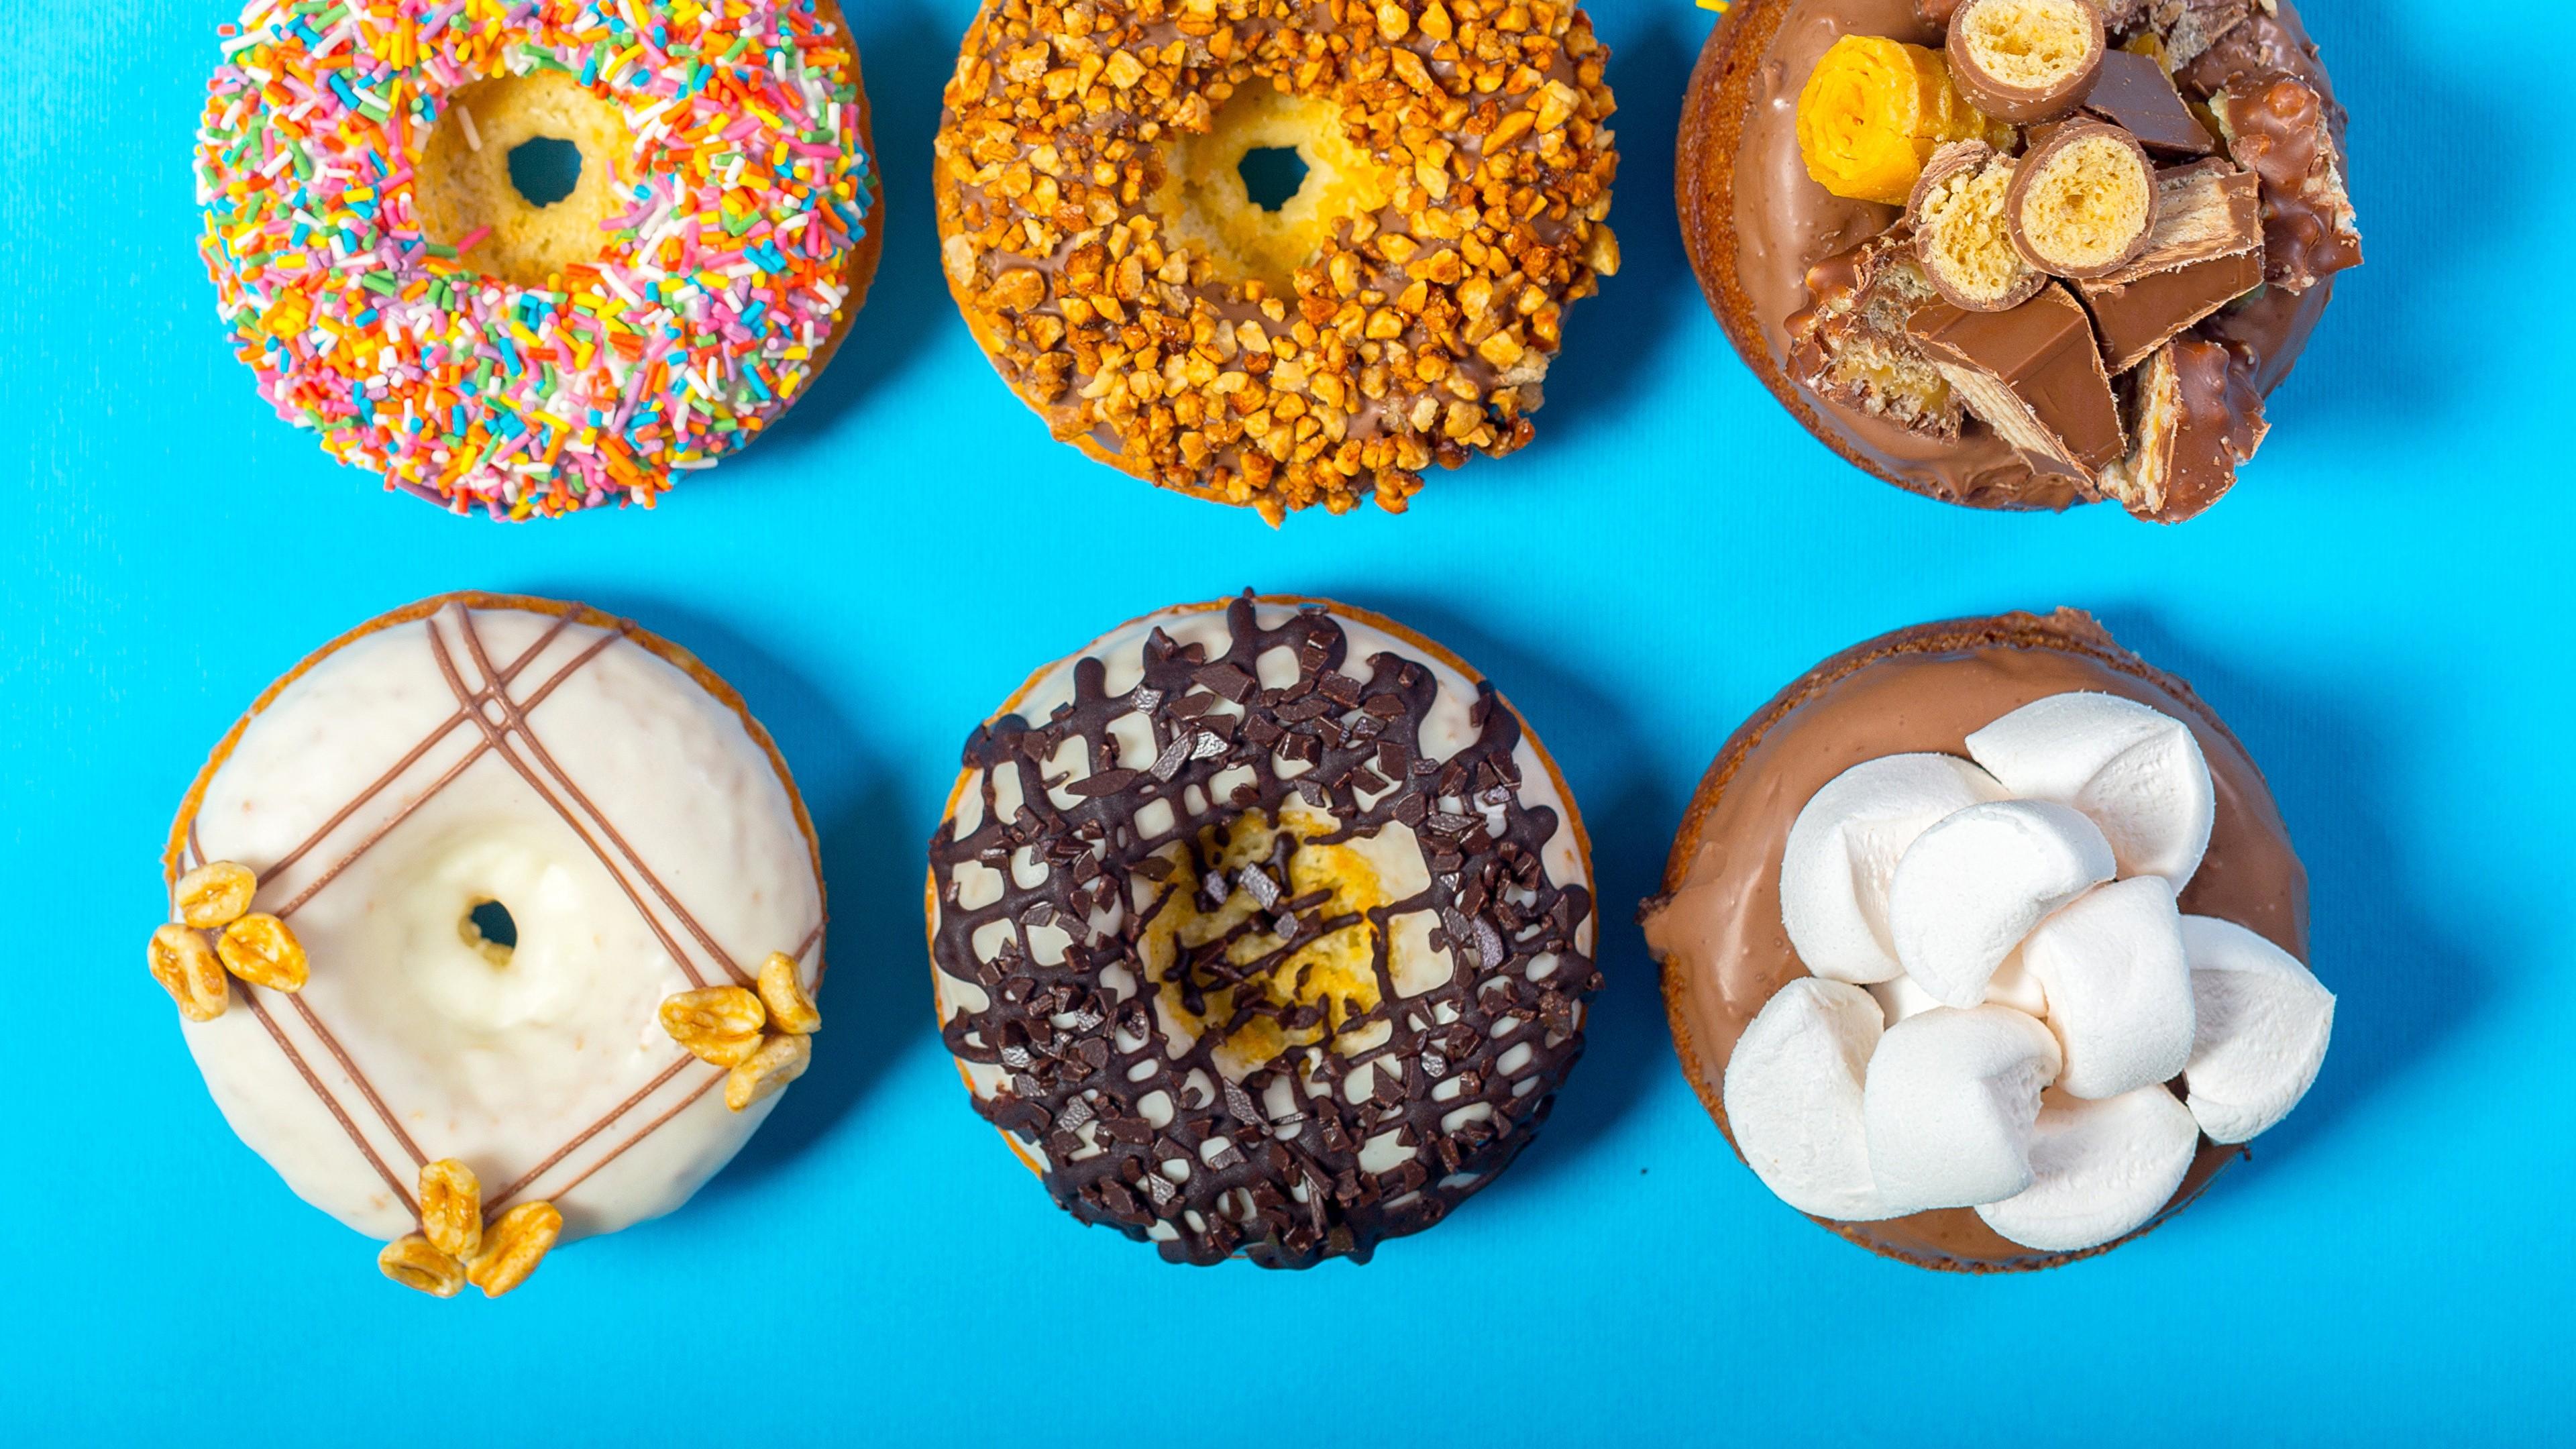 Wallpaper Donuts Delicious 4k Food 14763